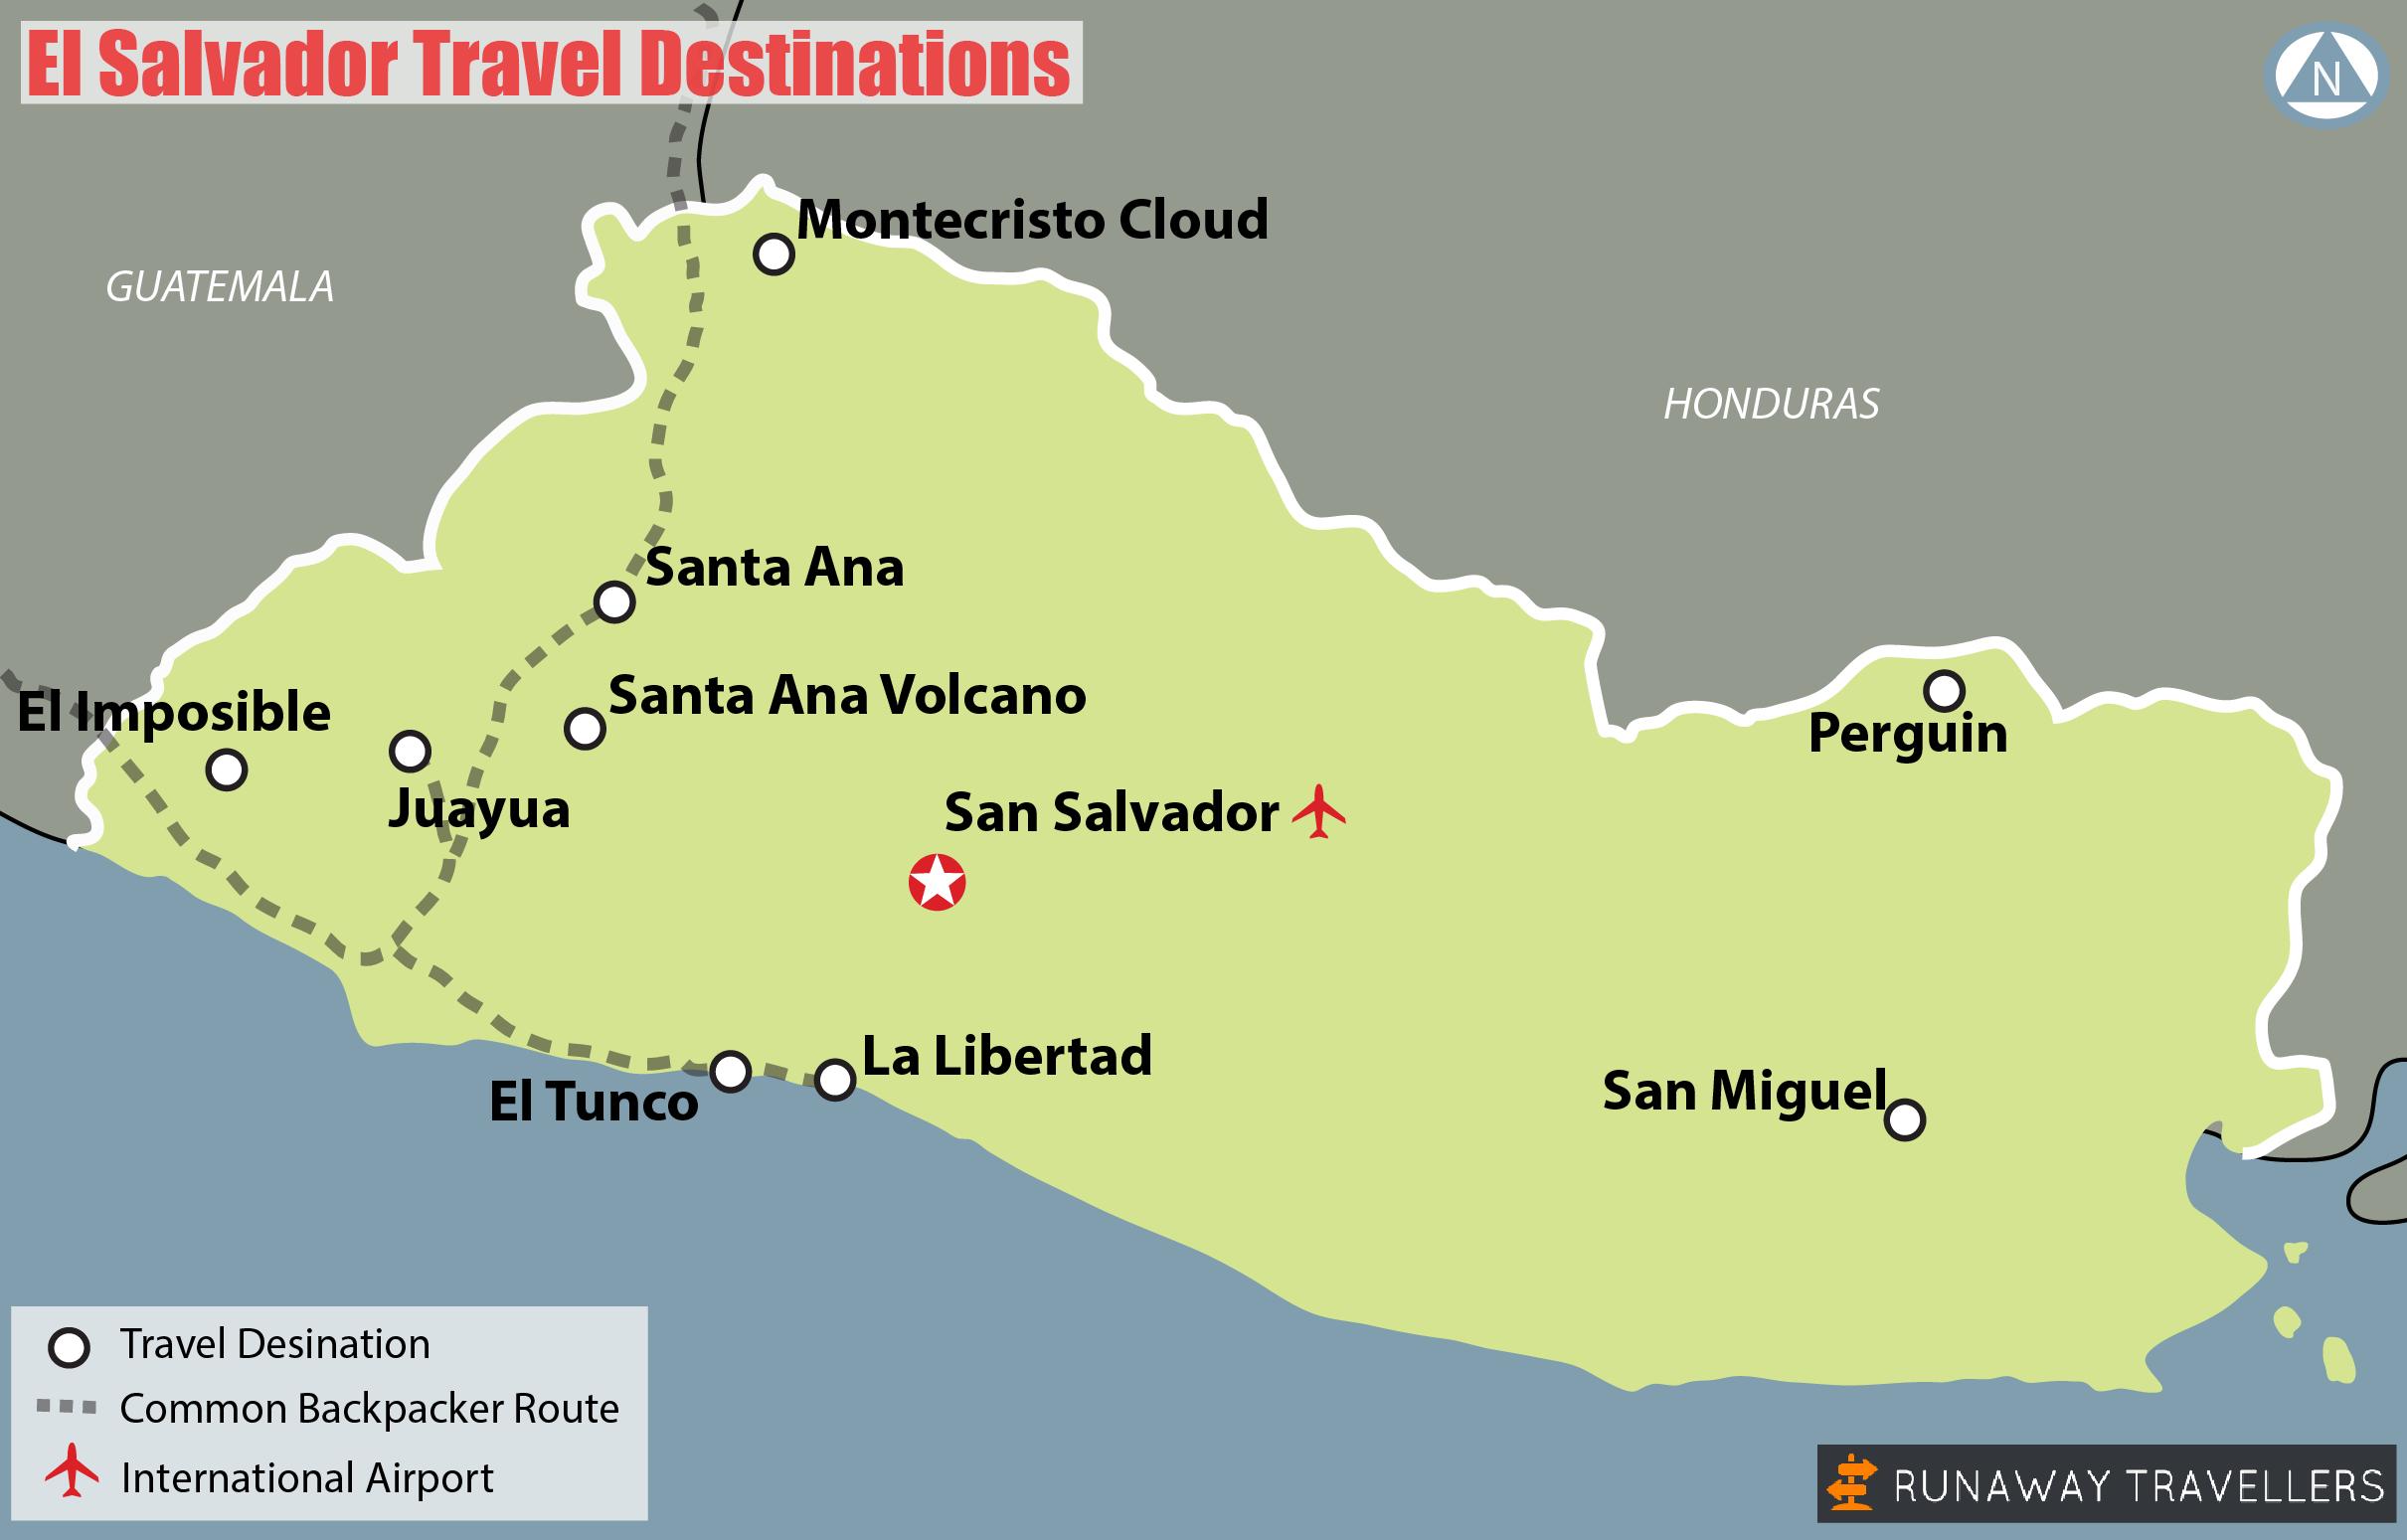 Map Of El Salvador Travel Destinations El Salvador Travel Things To Do Central America Travel